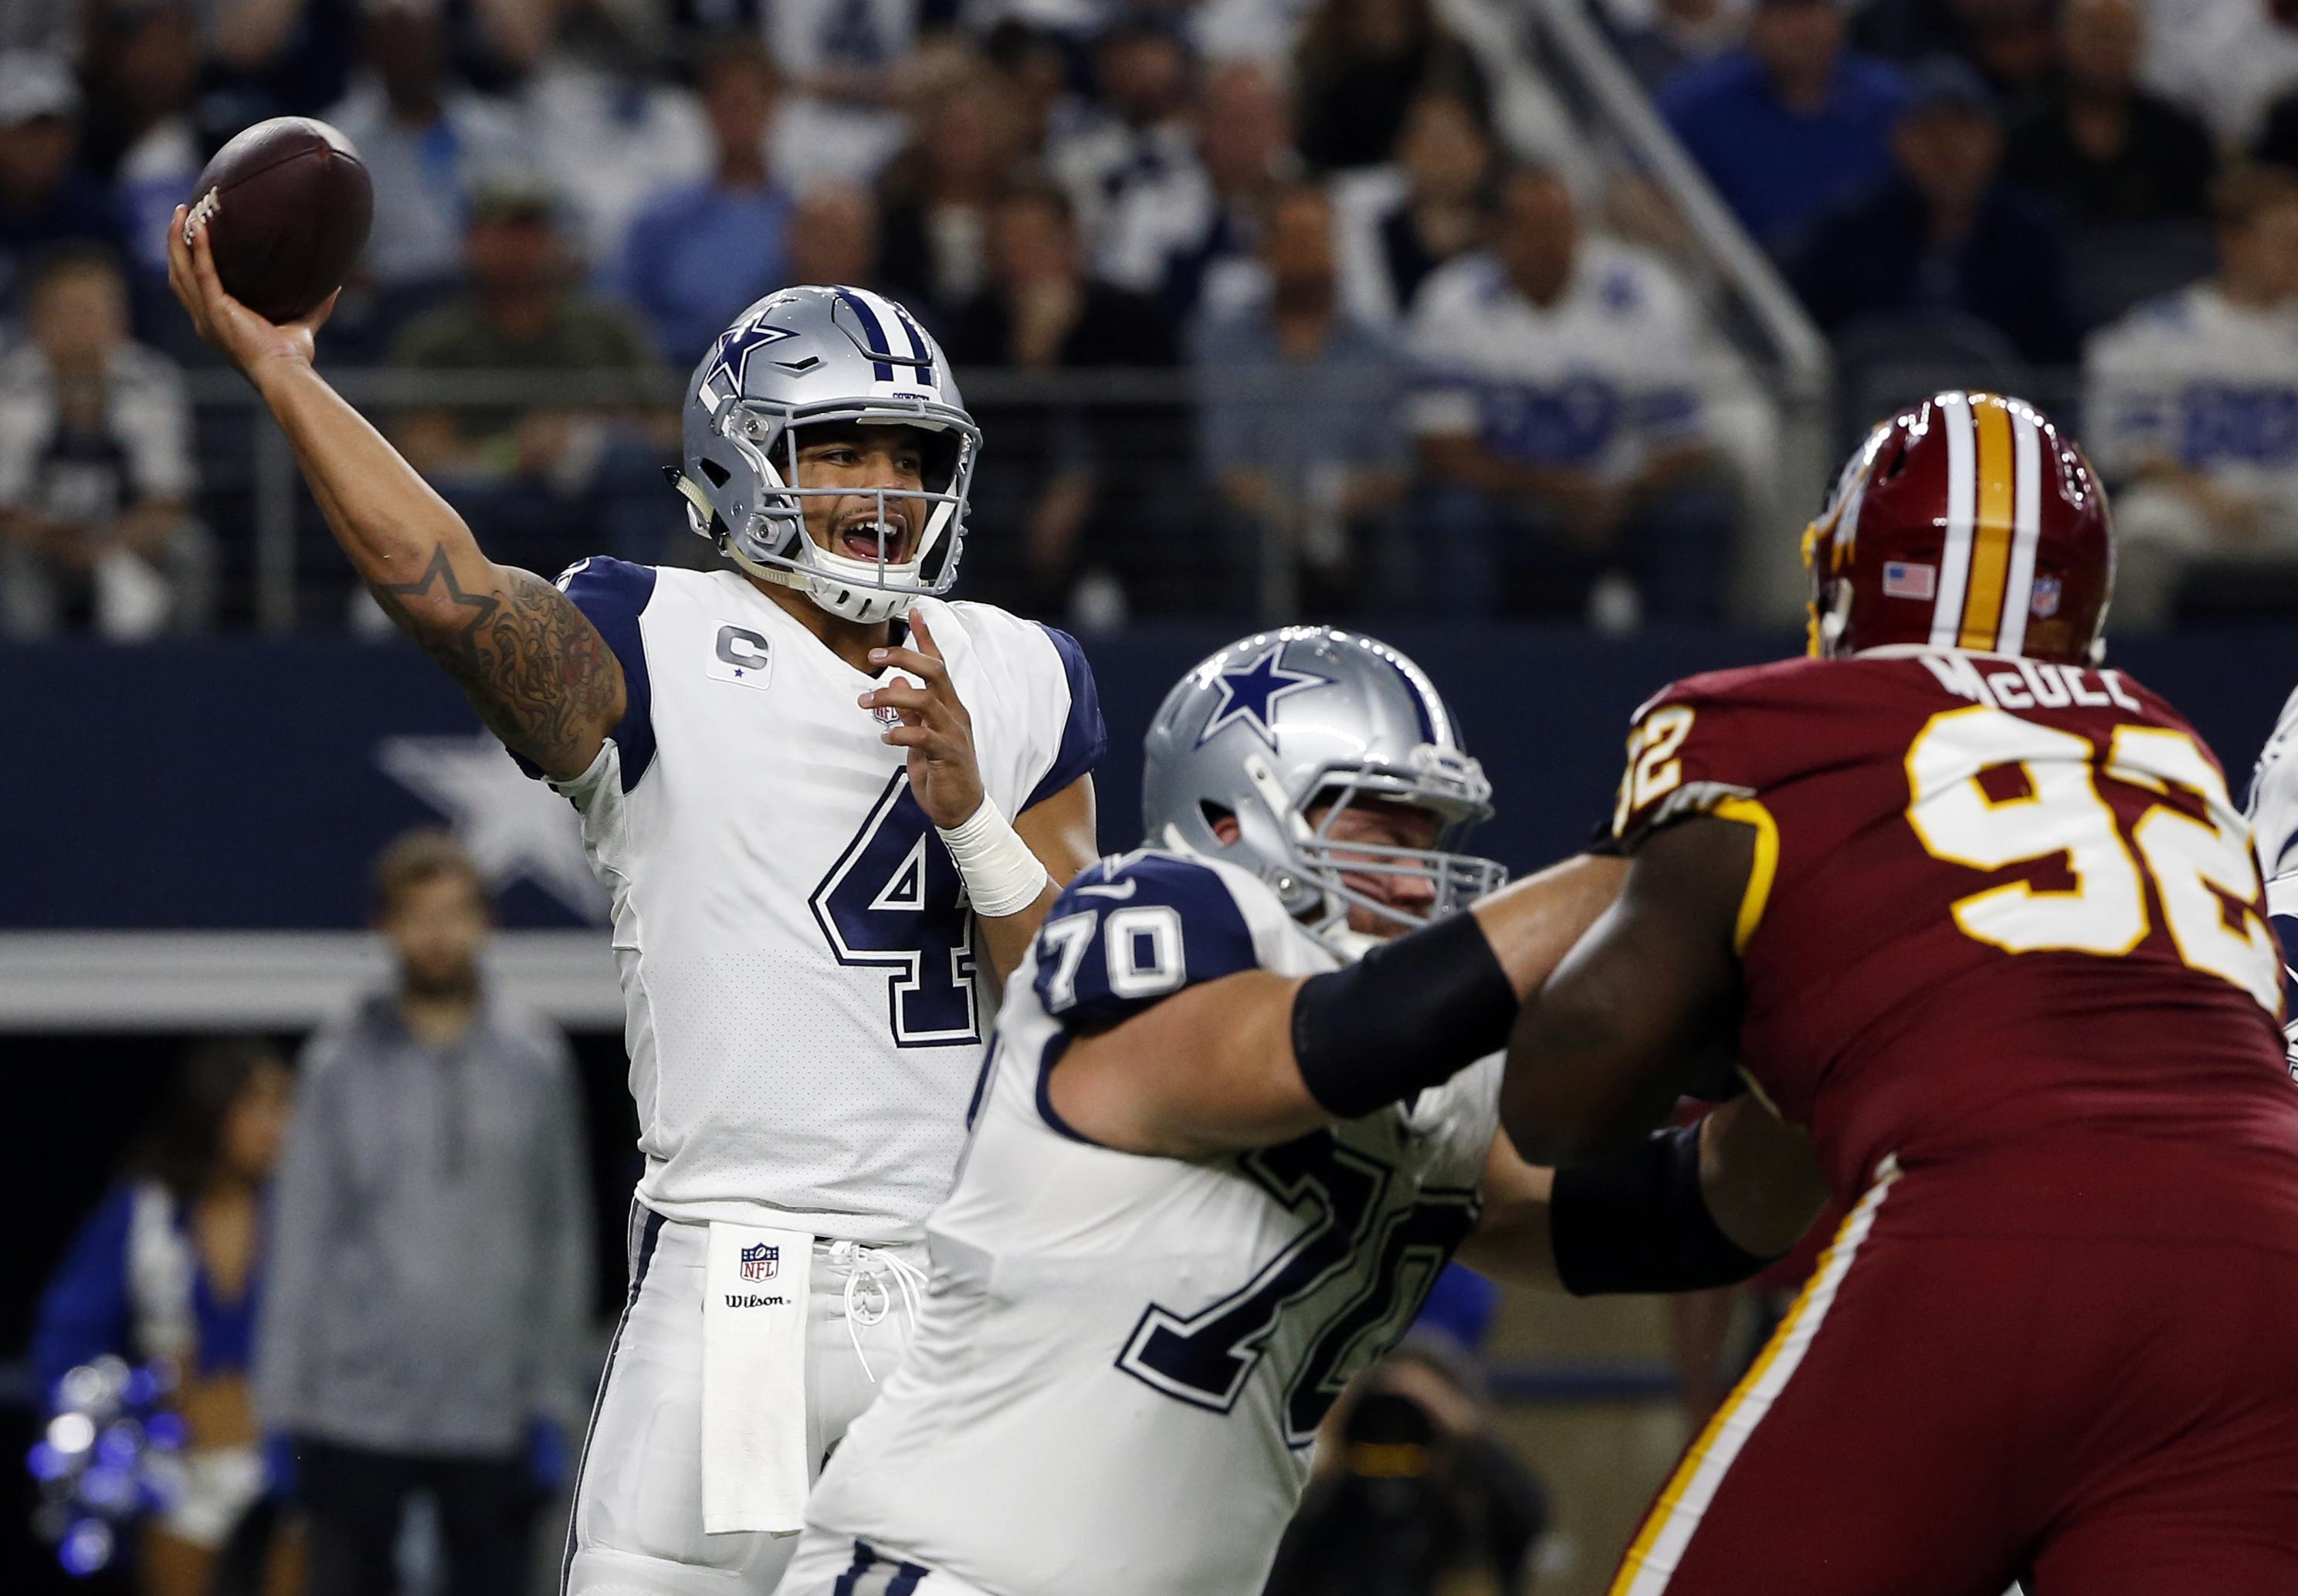 b32df7f8d Dallas Cowboys quarterback Dak Prescott (4) throws a pass as guard Zack  Martin (